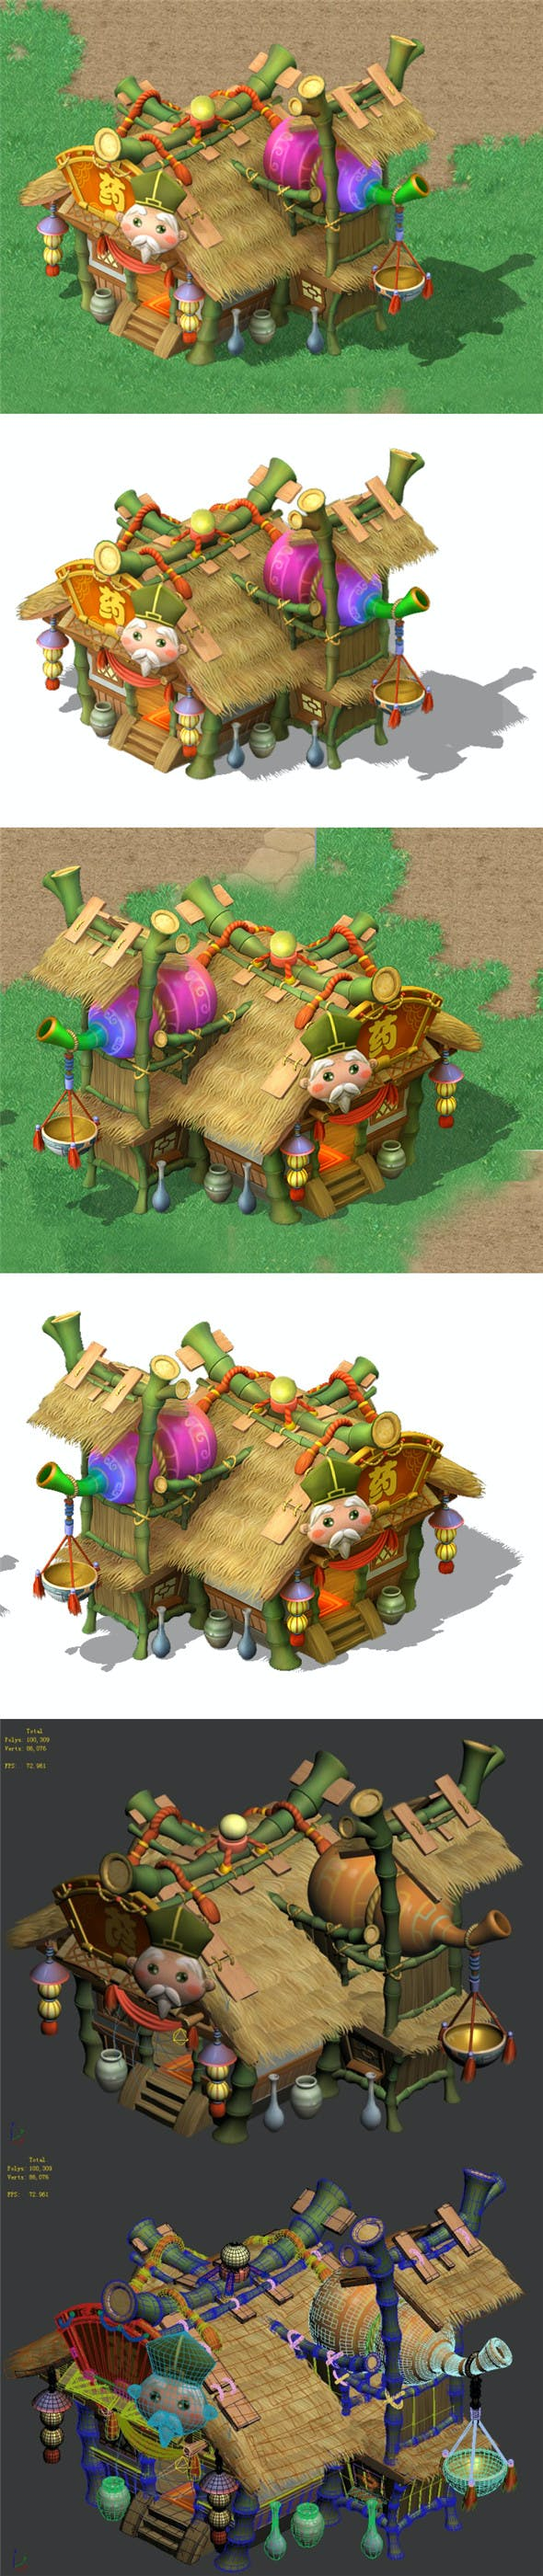 Cartoon World - Drugstore - 3DOcean Item for Sale